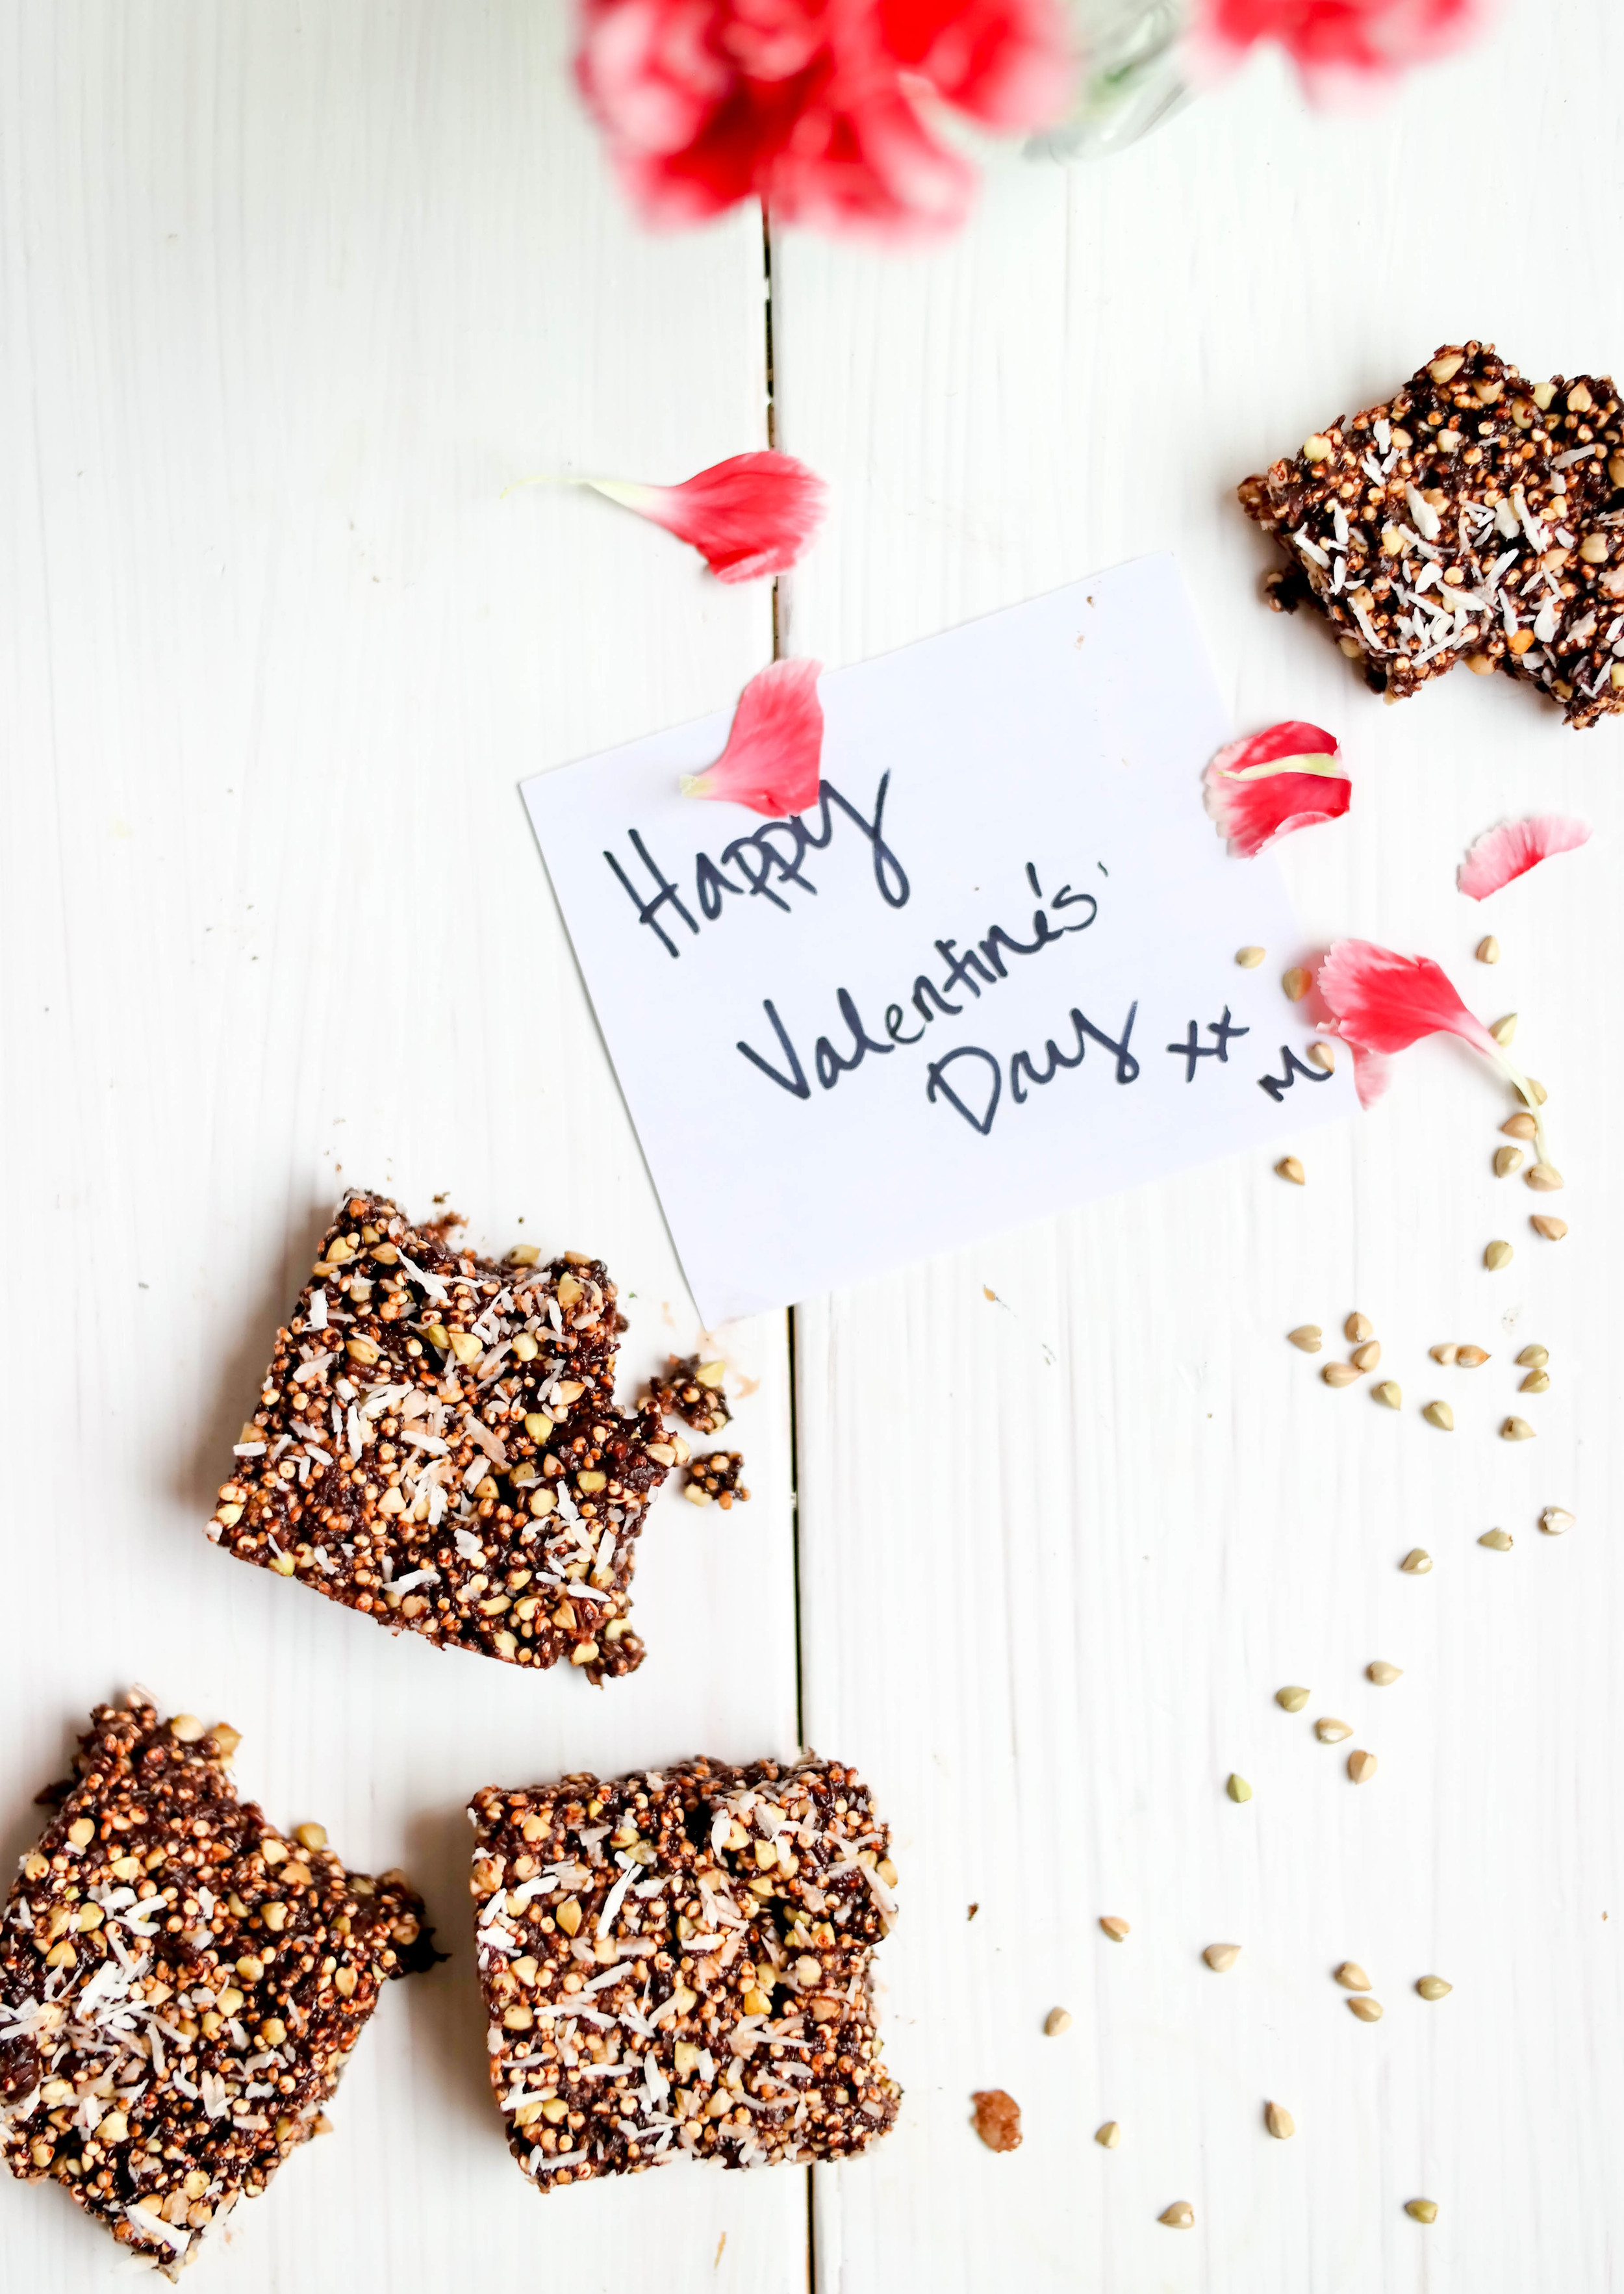 6-Chocolate-Crispy-Treats | www.8thandlake.com